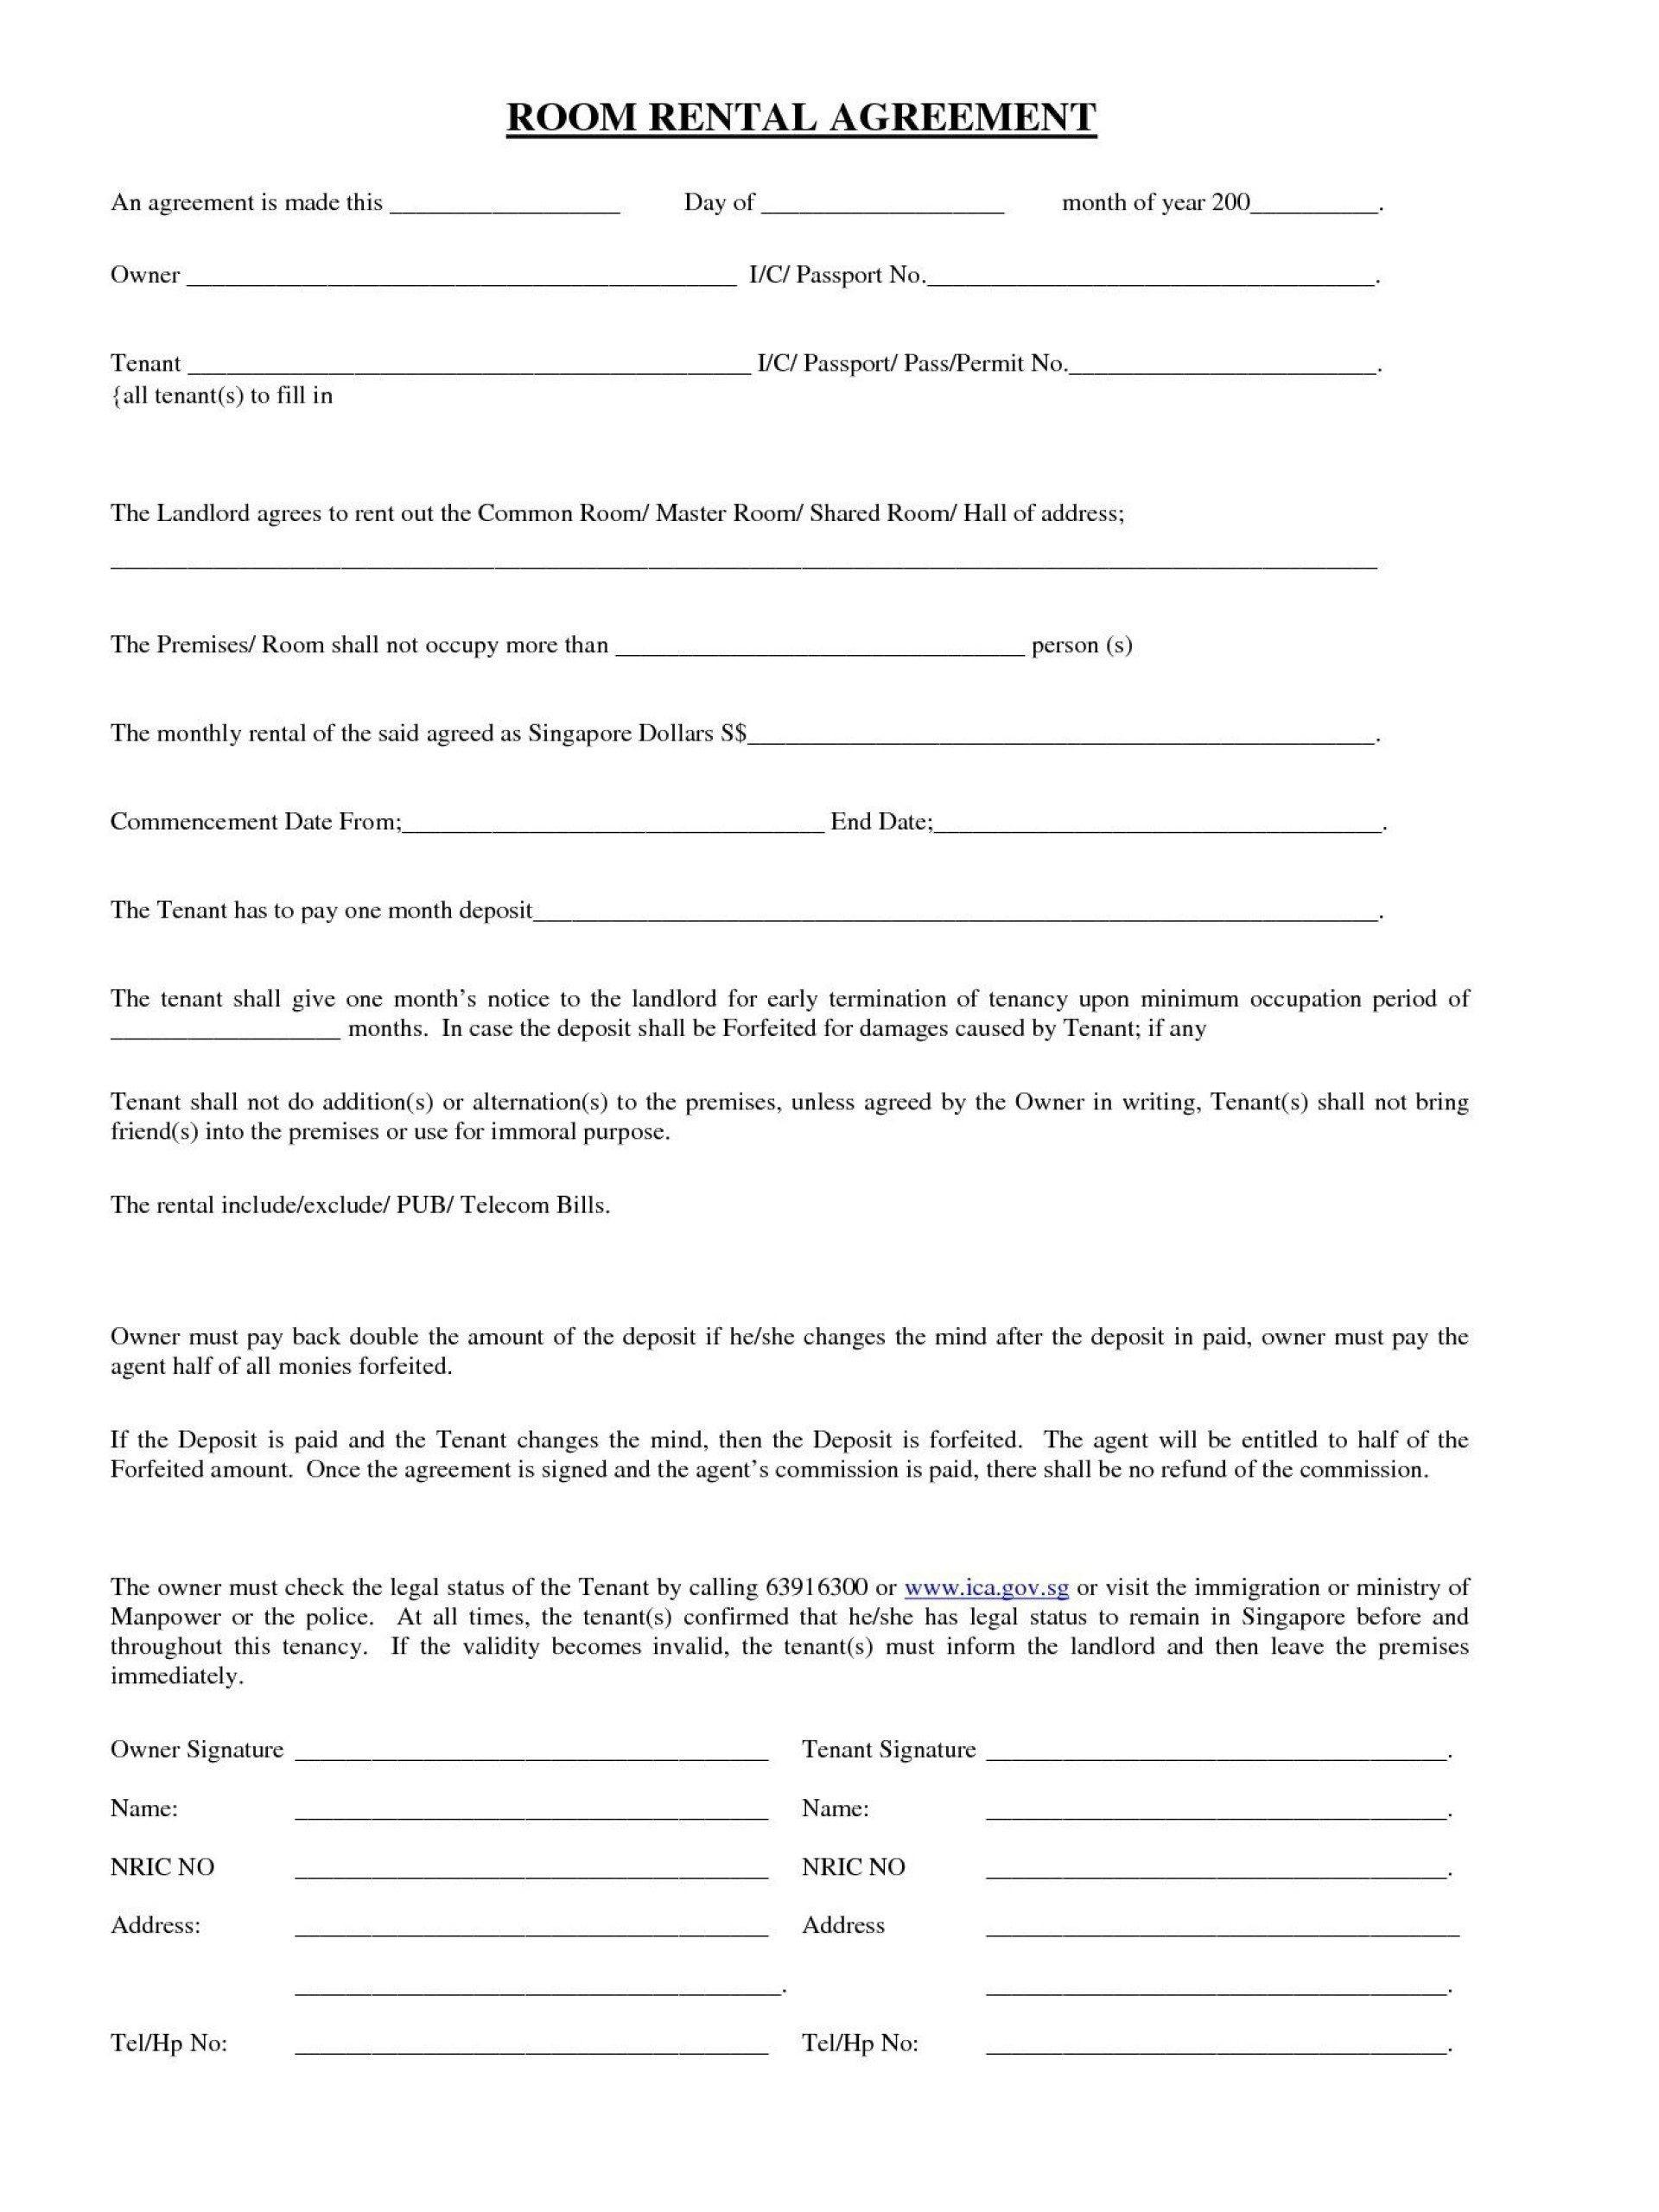 001 Frightening Tenancy Agreement Template Word Free Sample  Uk 2020 Rental Doc Lease1920